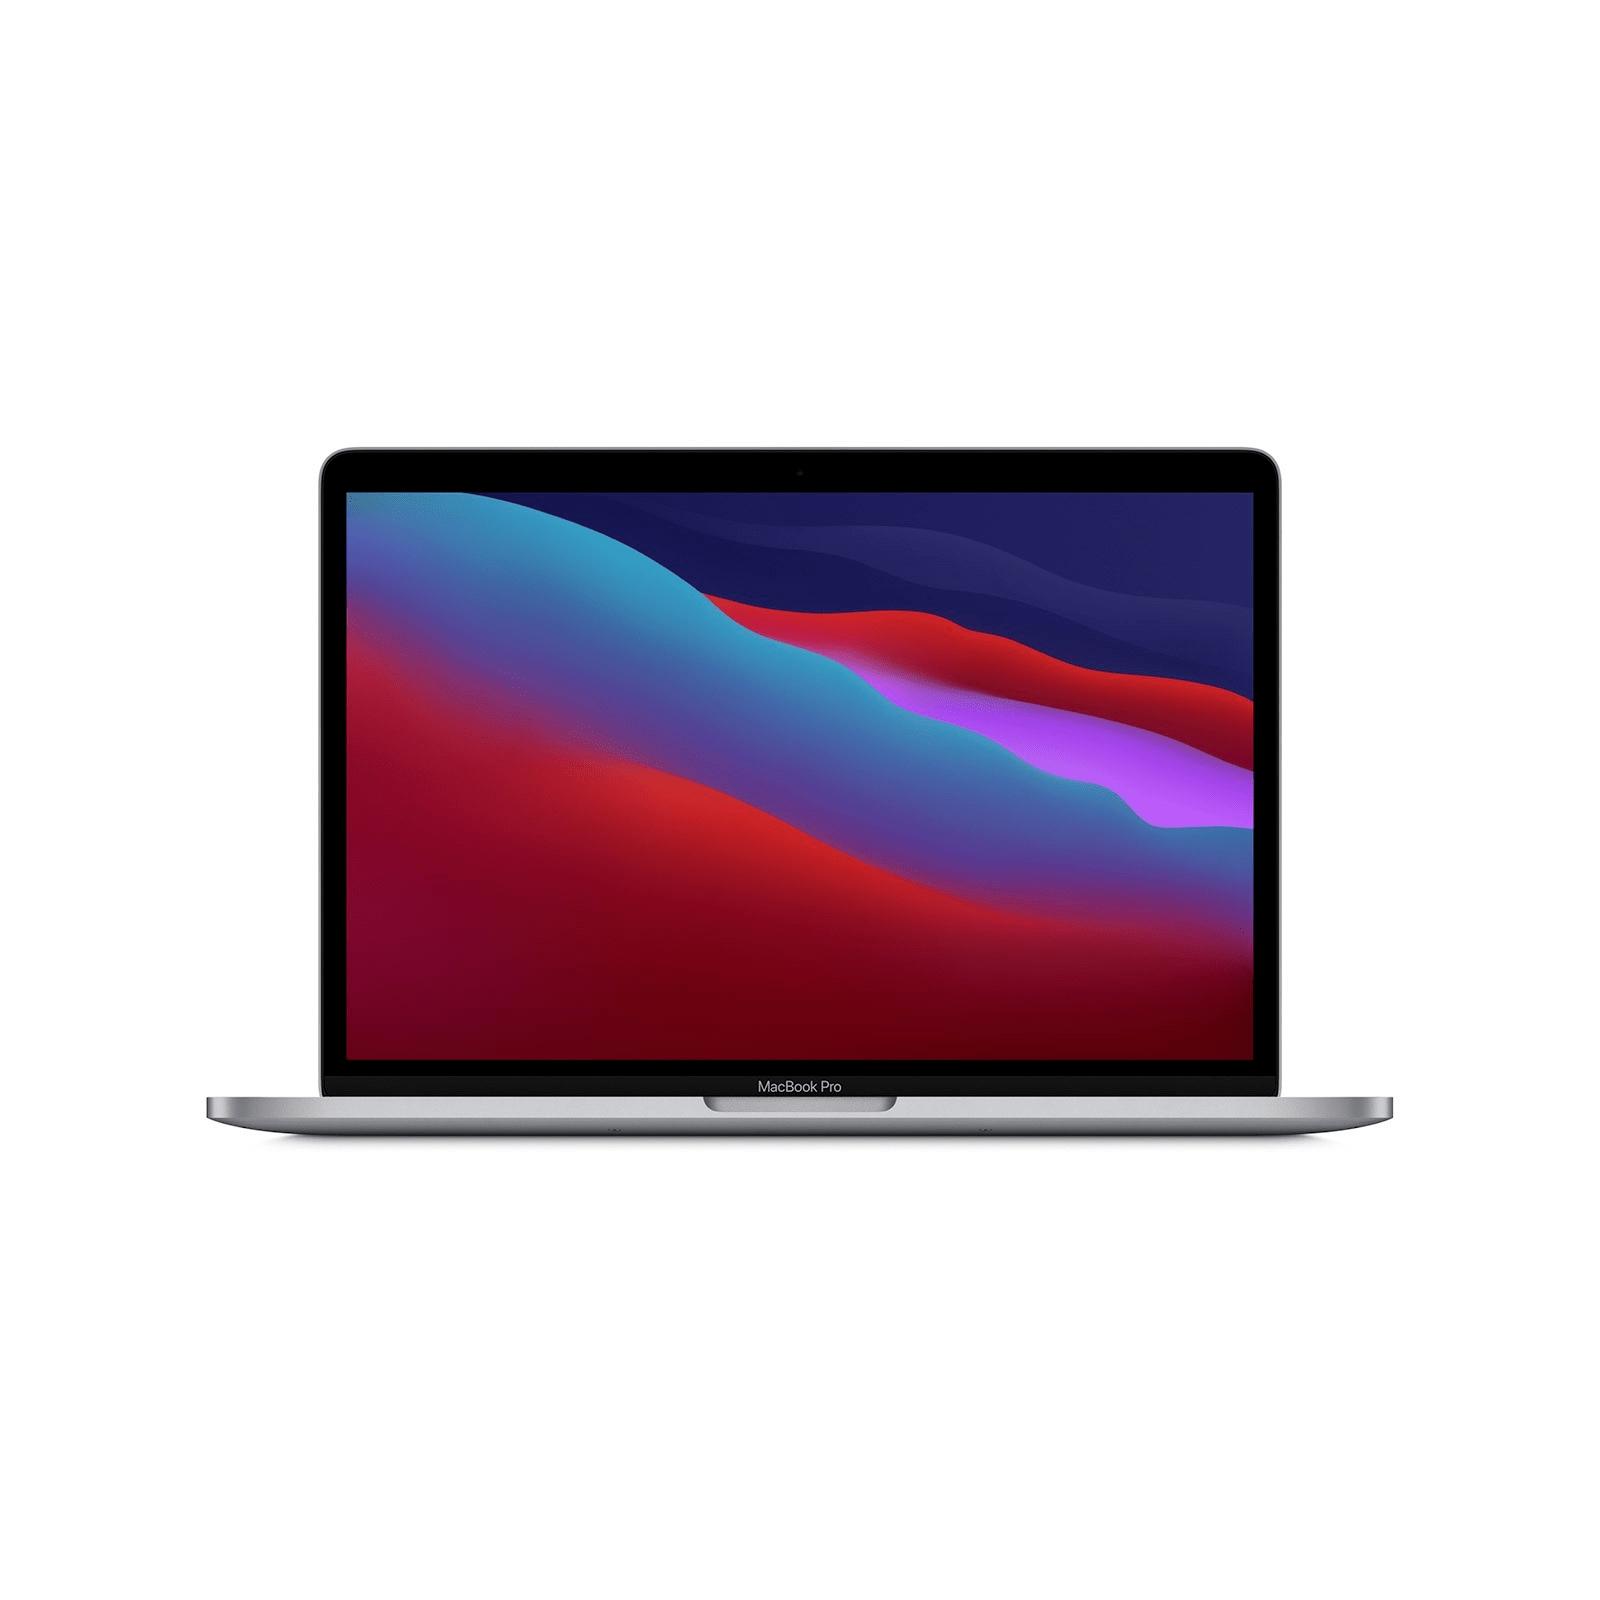 13-inch MacBook Pro | Apple M1 chip | 256GB - Space Grey